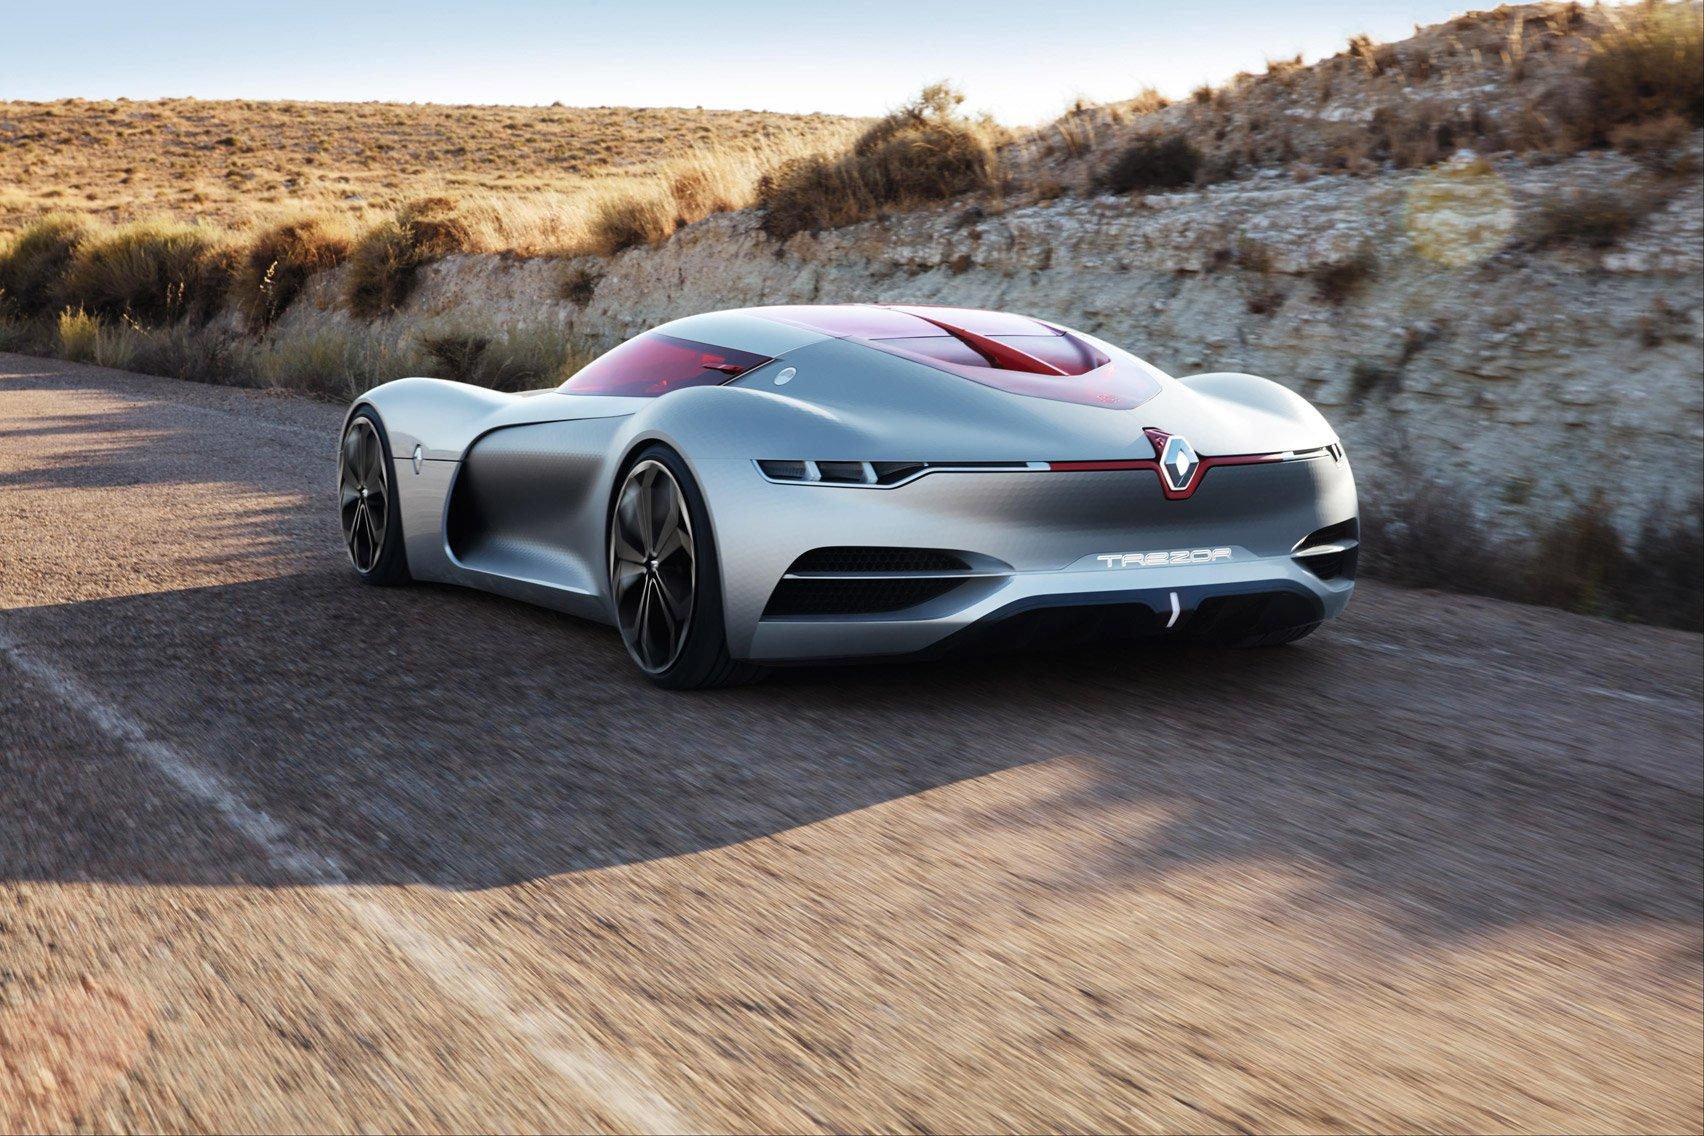 renault-trezor-concept-car-paris-motor-show_dezeen_1704_col_0